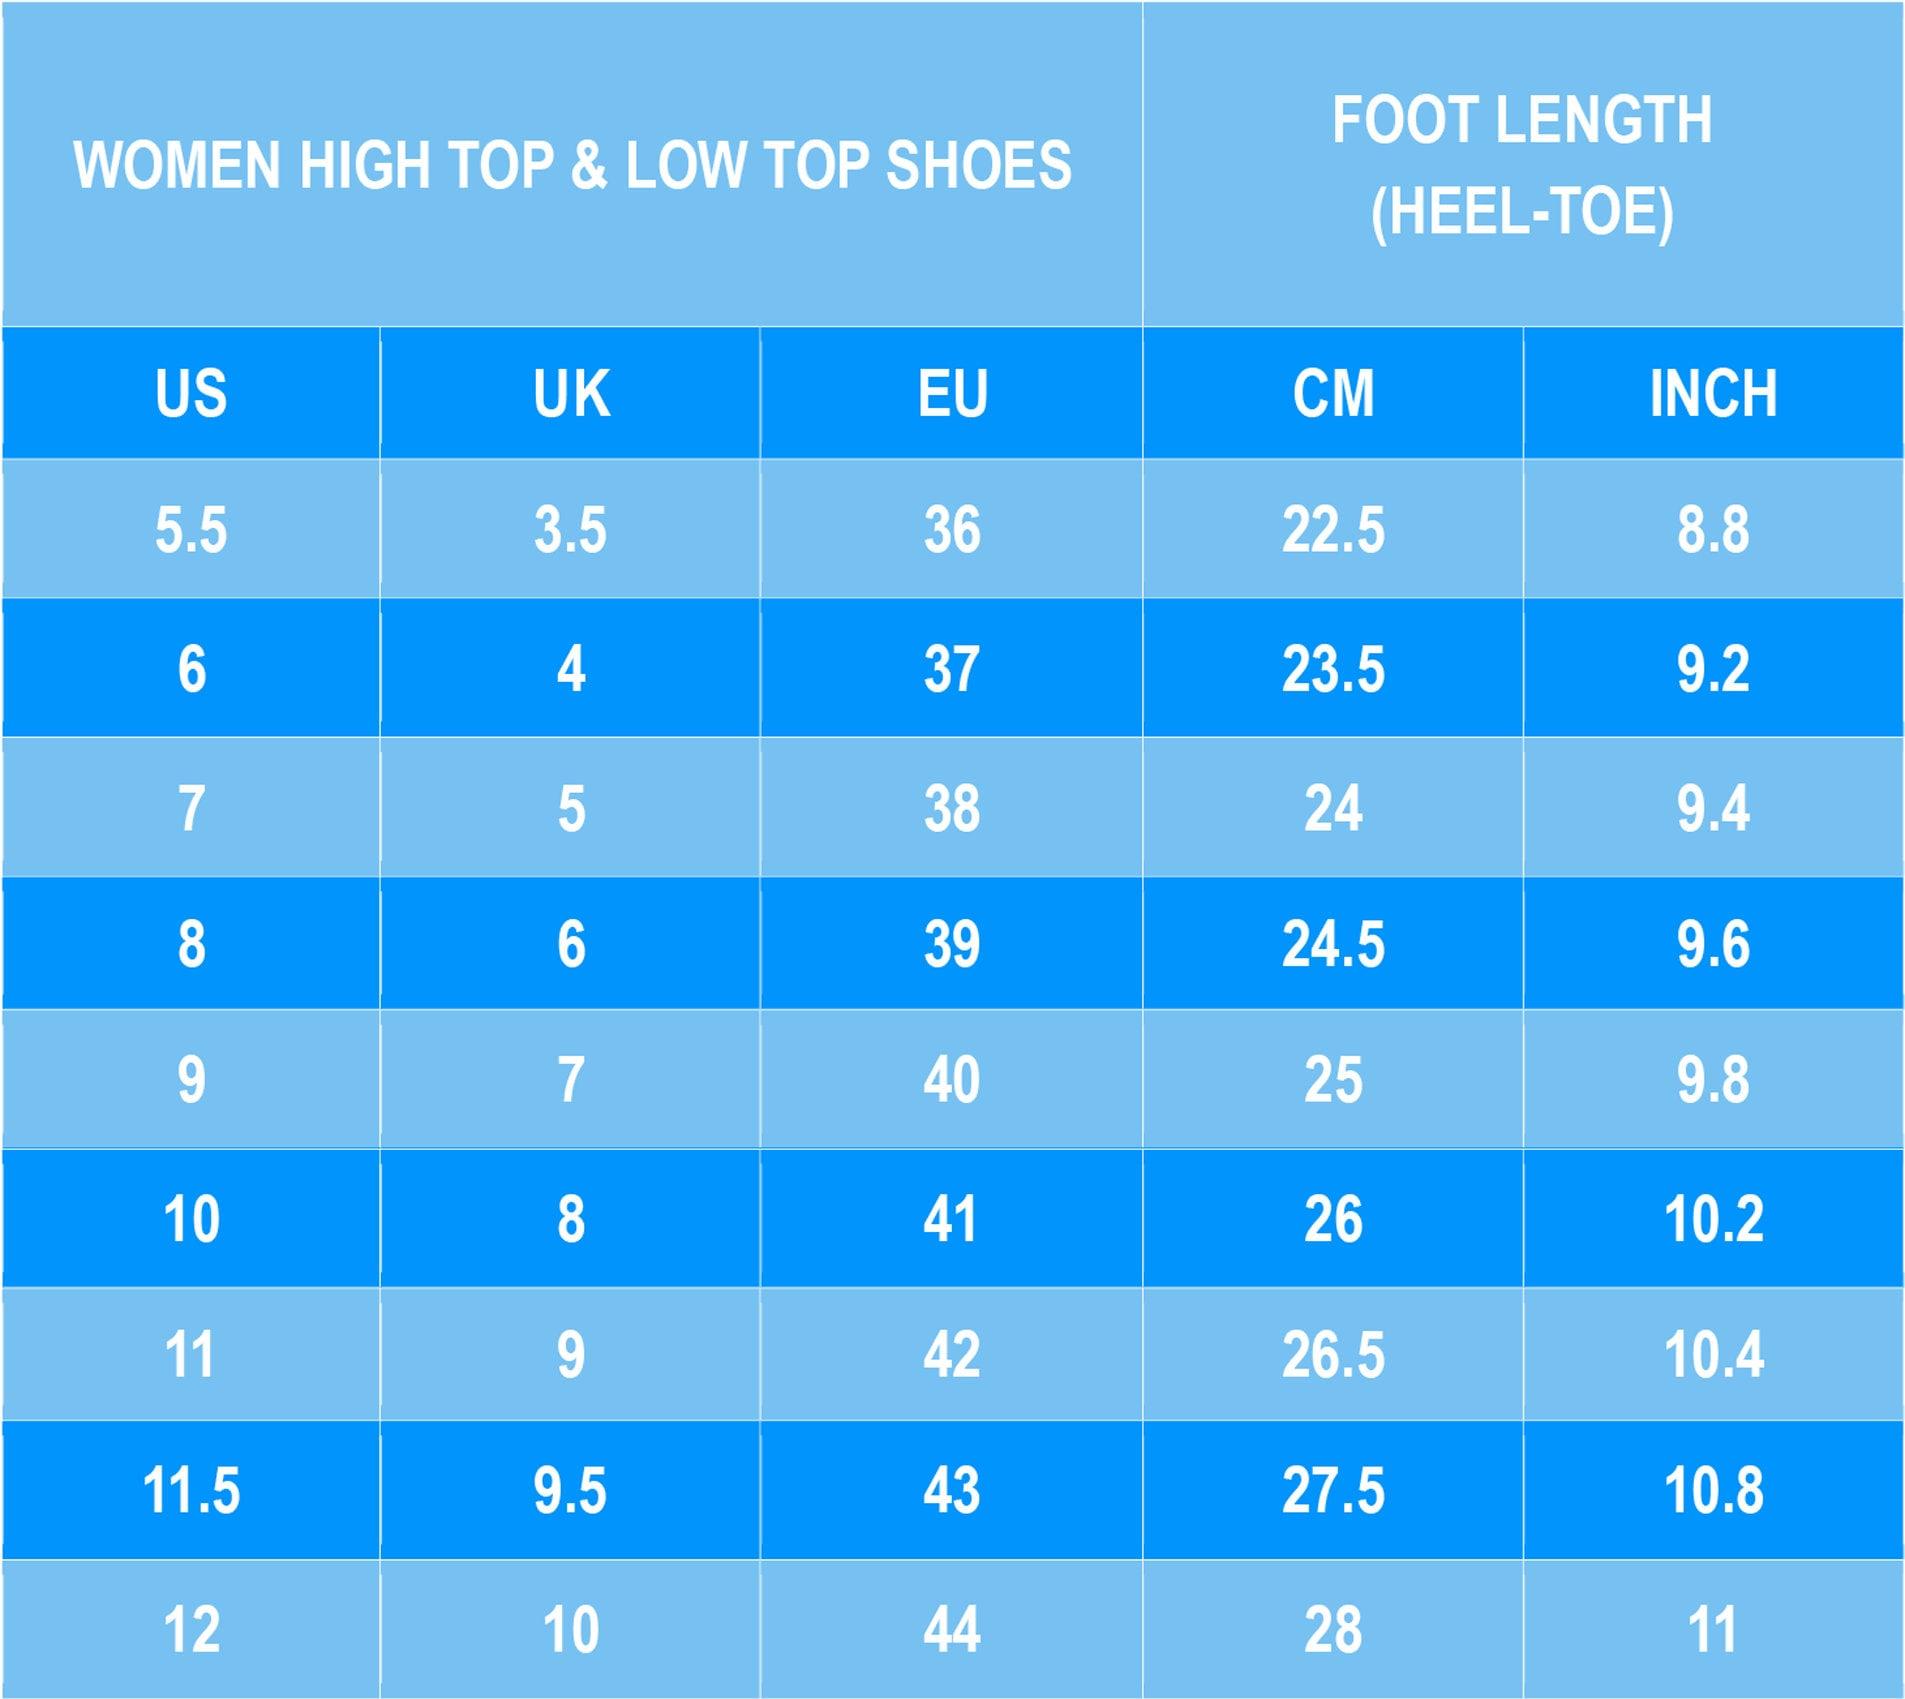 Fox chaussures | Baskets de renard | Fox Fox Fox Chaussures femmes | Motif de renard | Impression de renard | Chaussures avec renard | Fox chaussures de sport pour les femmes | Cadeau de renard | Renard 3ab678